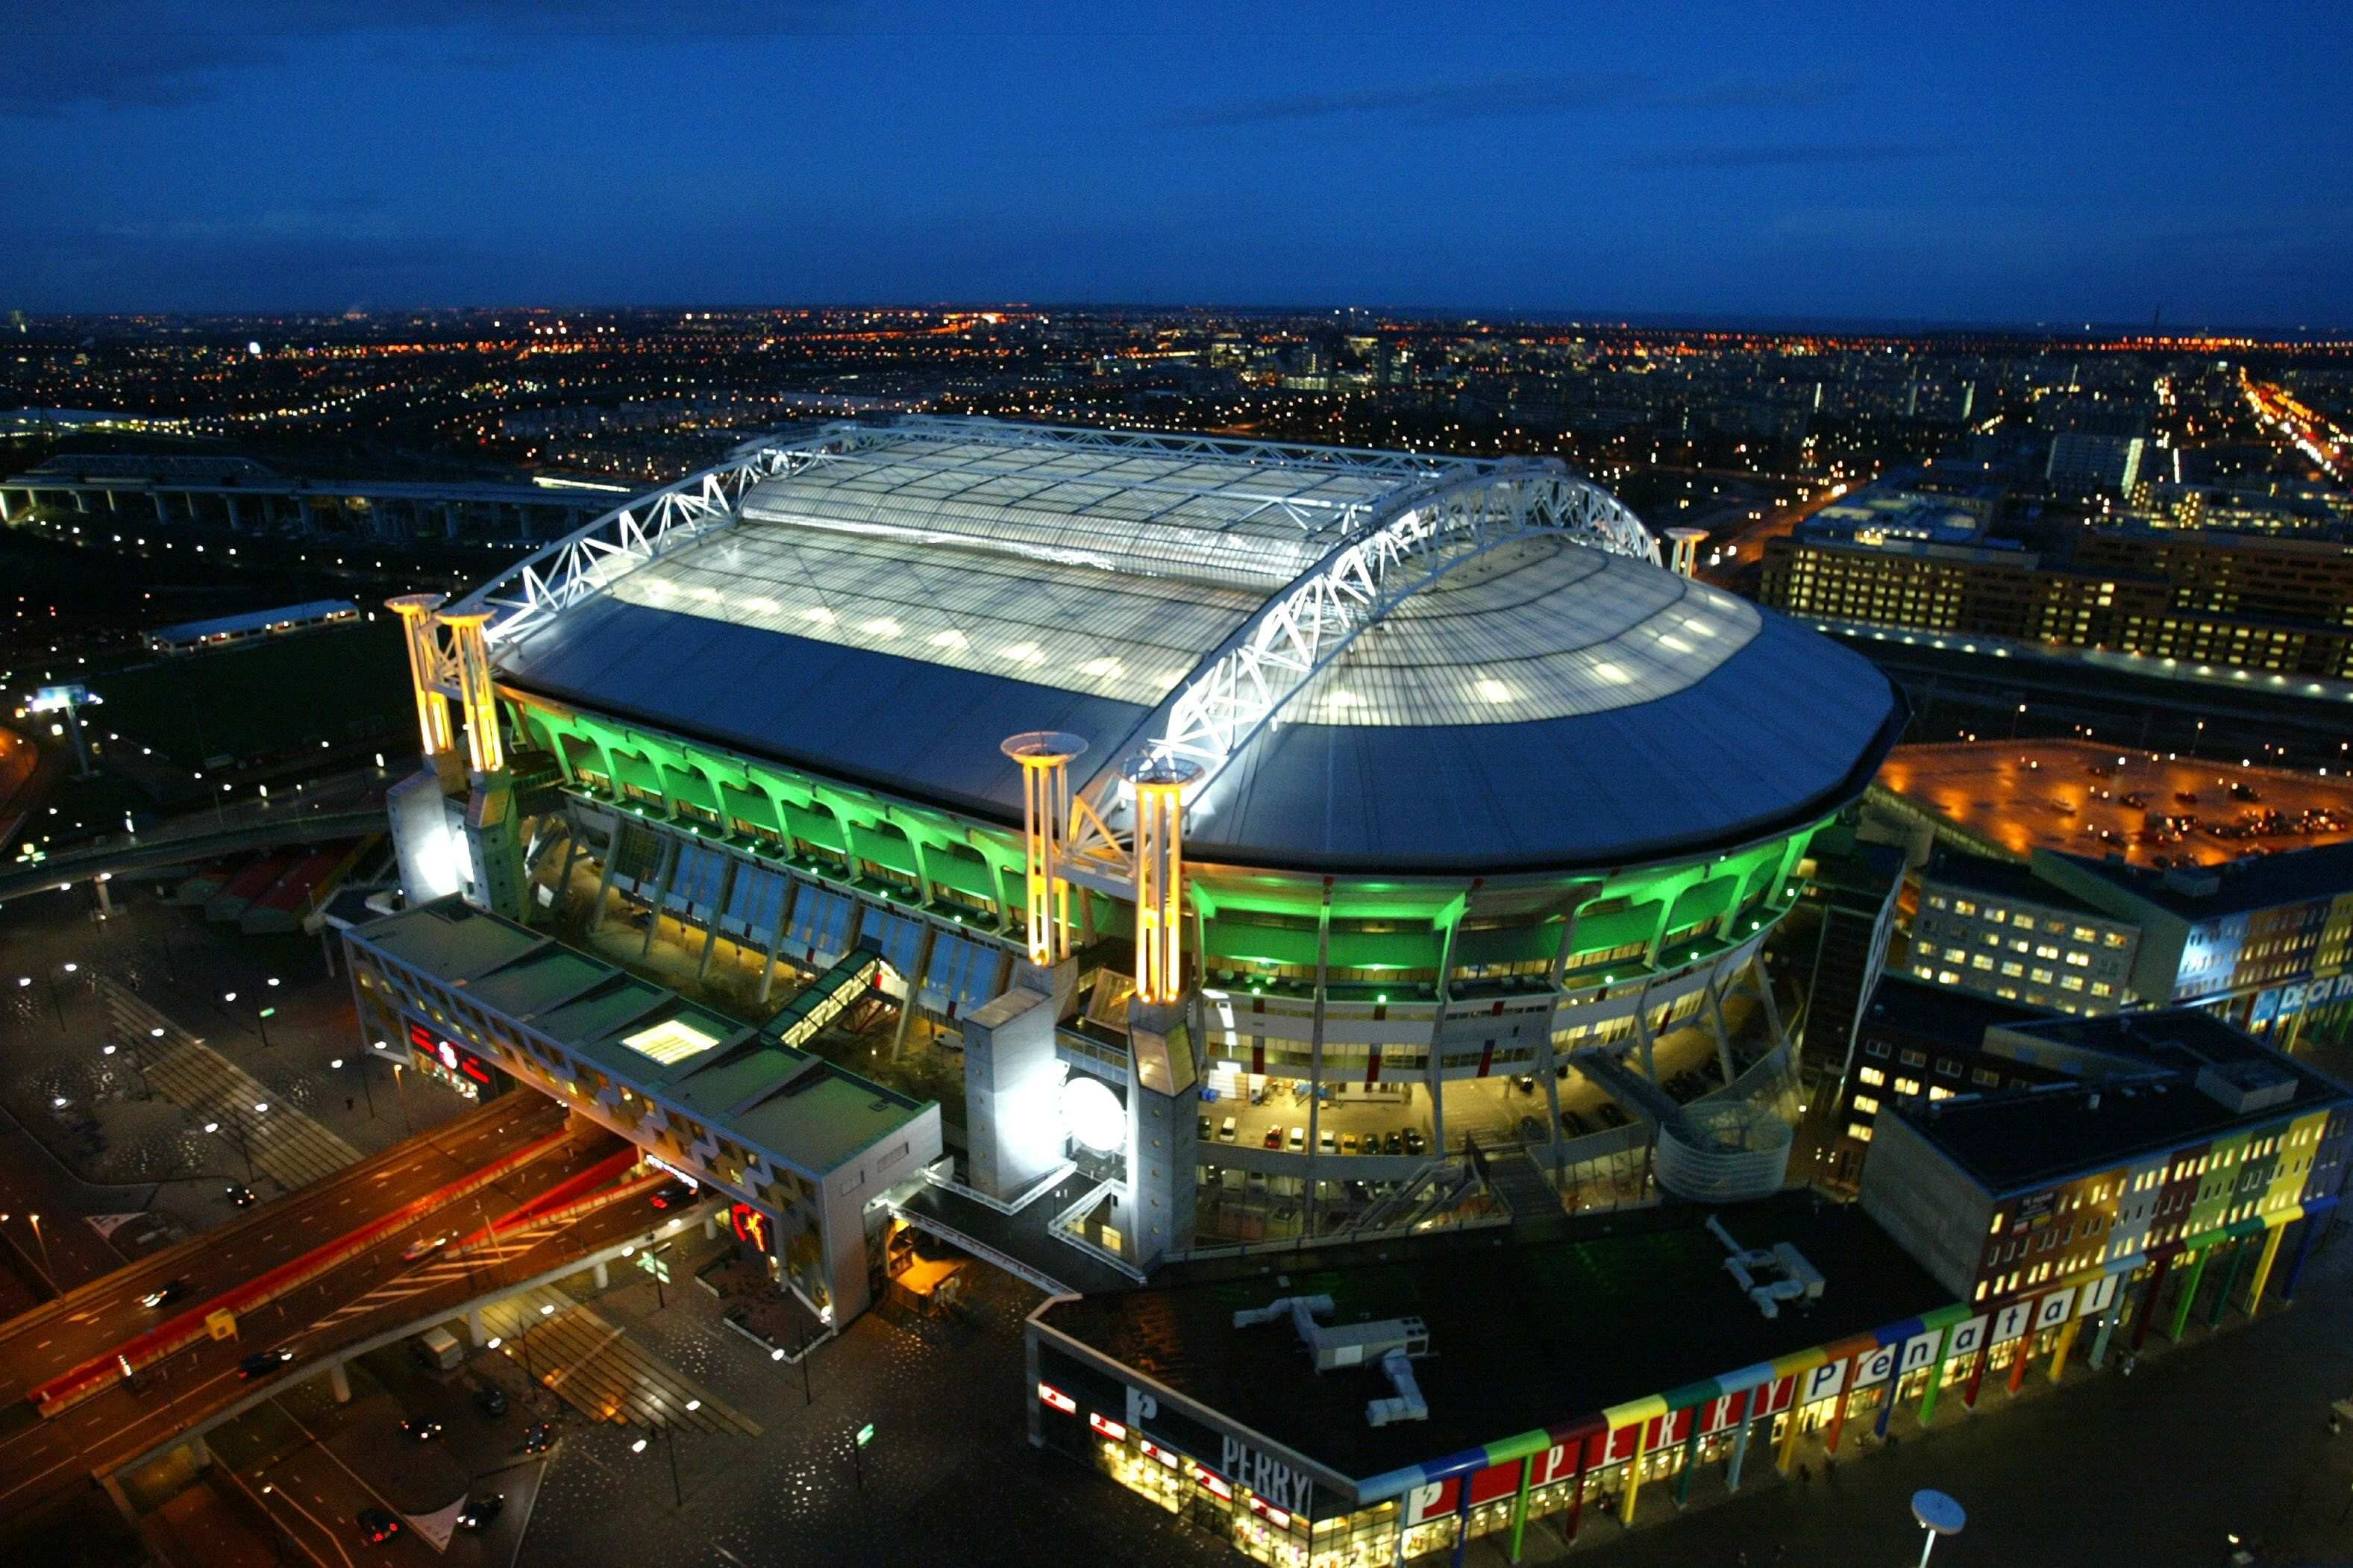 Football Stadium Hd Wallpapers Football Stadiums Soccer Stadium